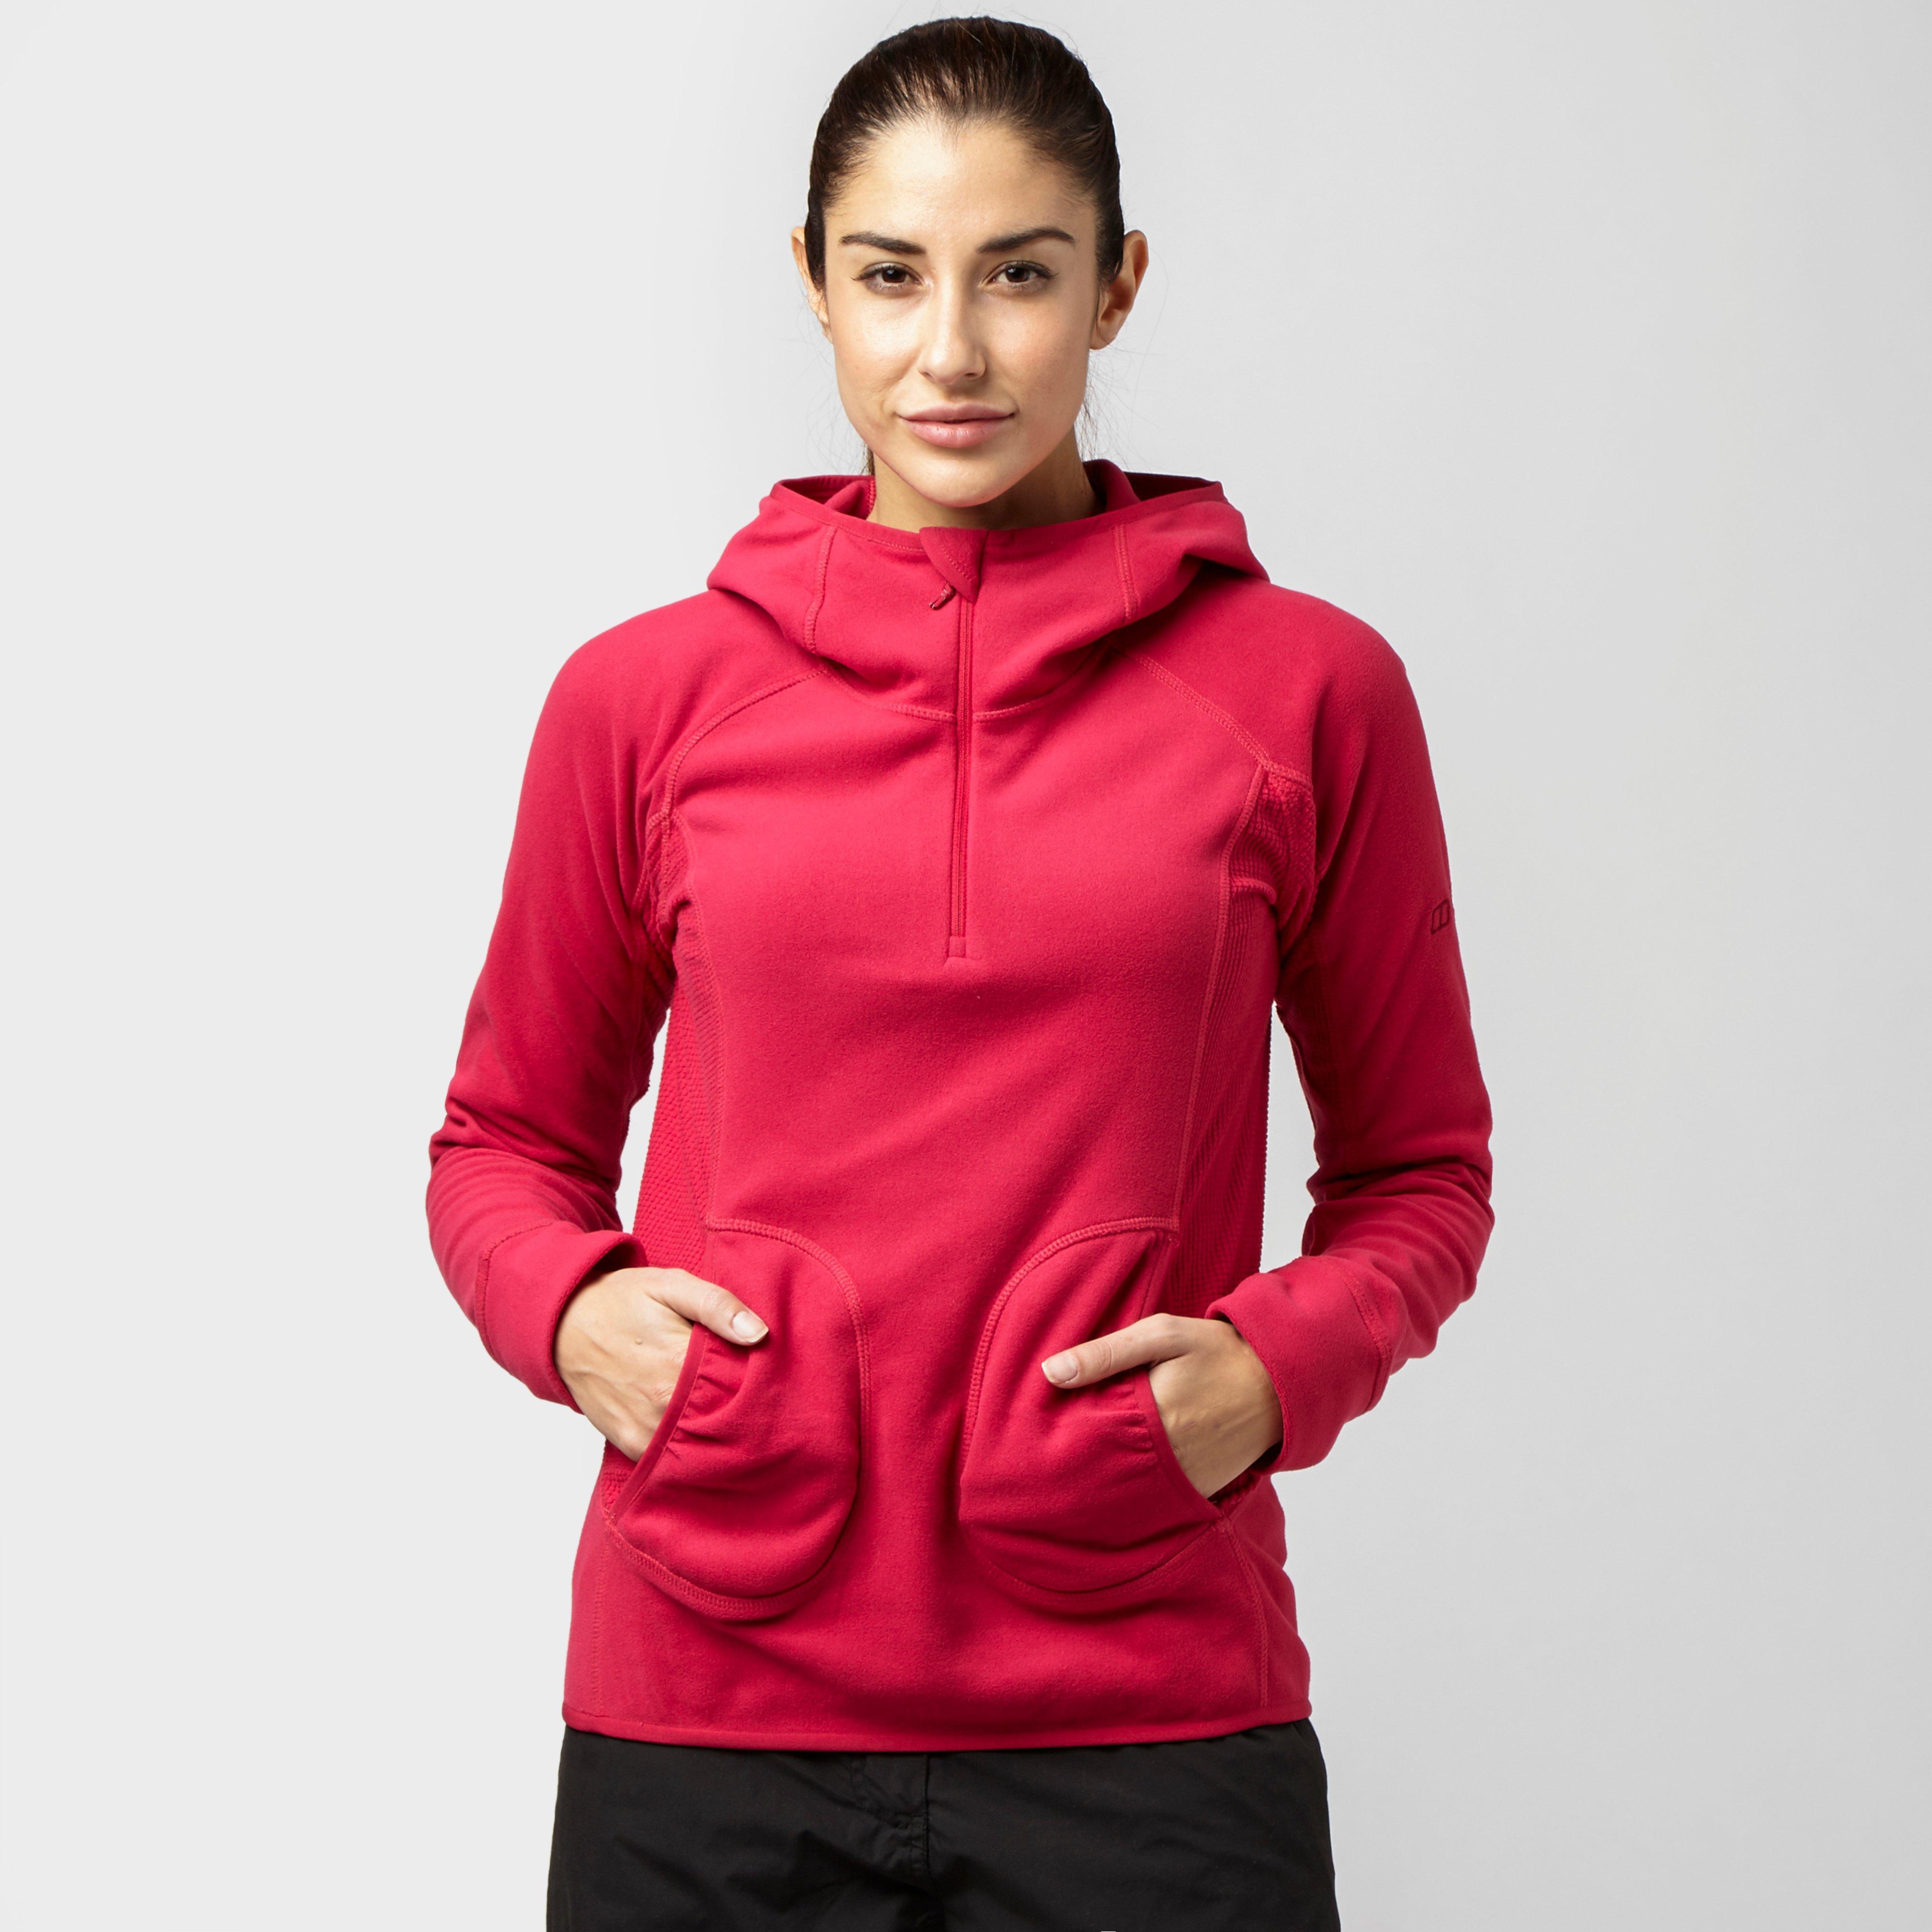 Half jacket women